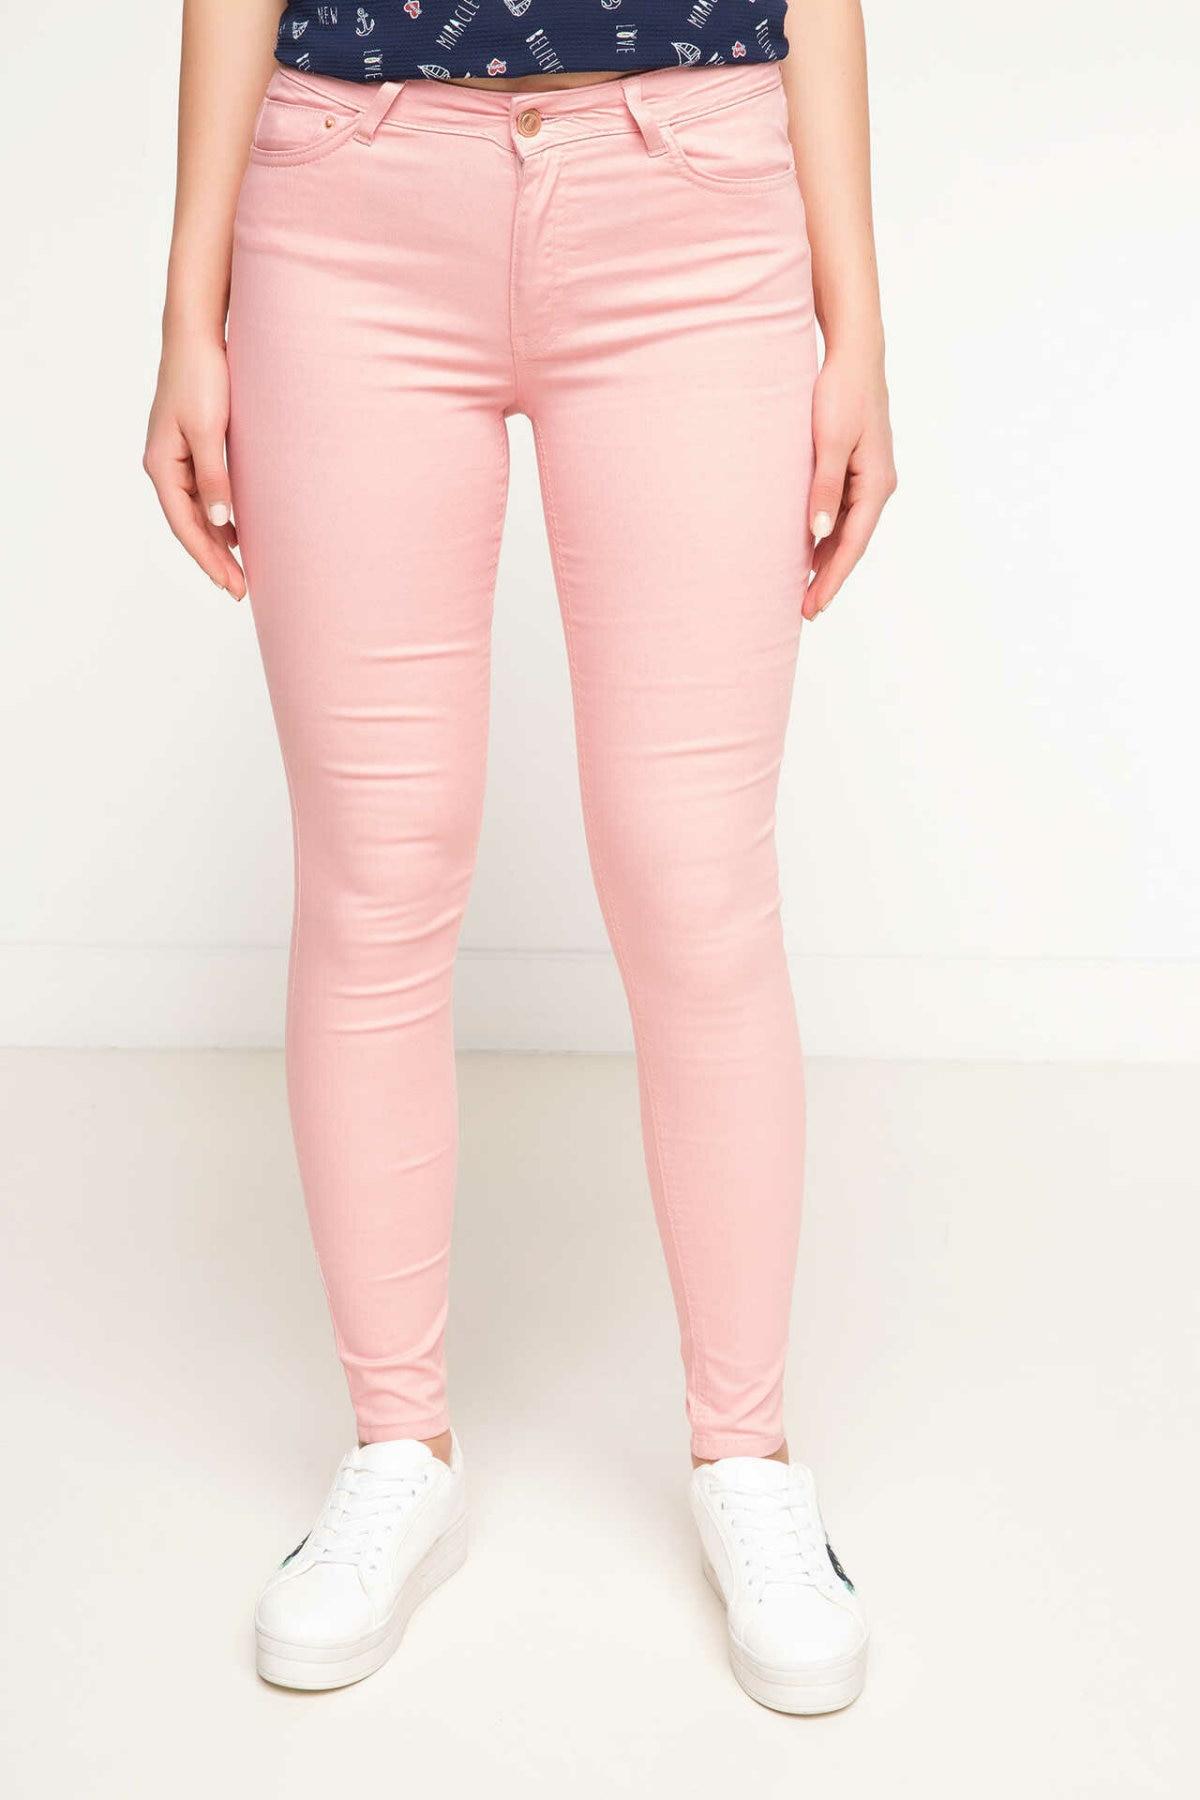 DeFacto Woman Pink Color Skinny Pants Women Casual Long Pants Female Pencil Pant Female Spring Bottoms Trousers-G6303AZ17SM